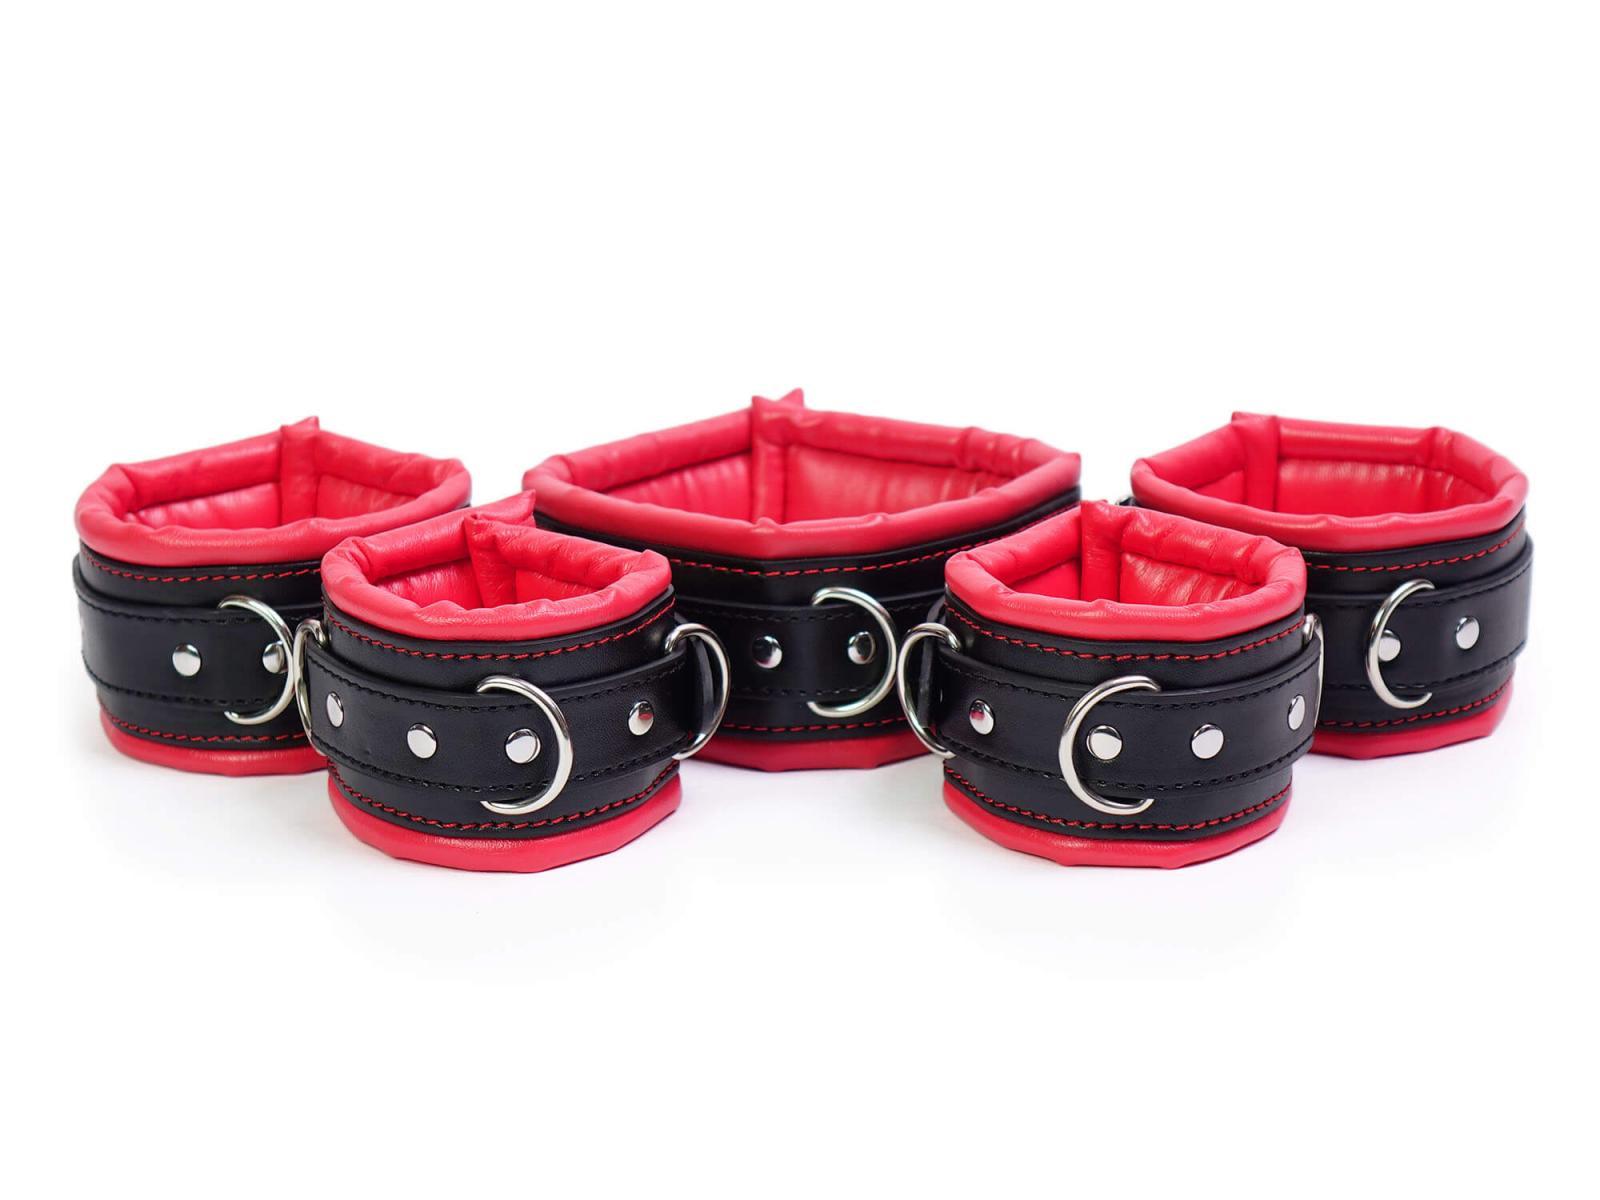 Bondage Manschetten Set gepolstert rot-schwarz